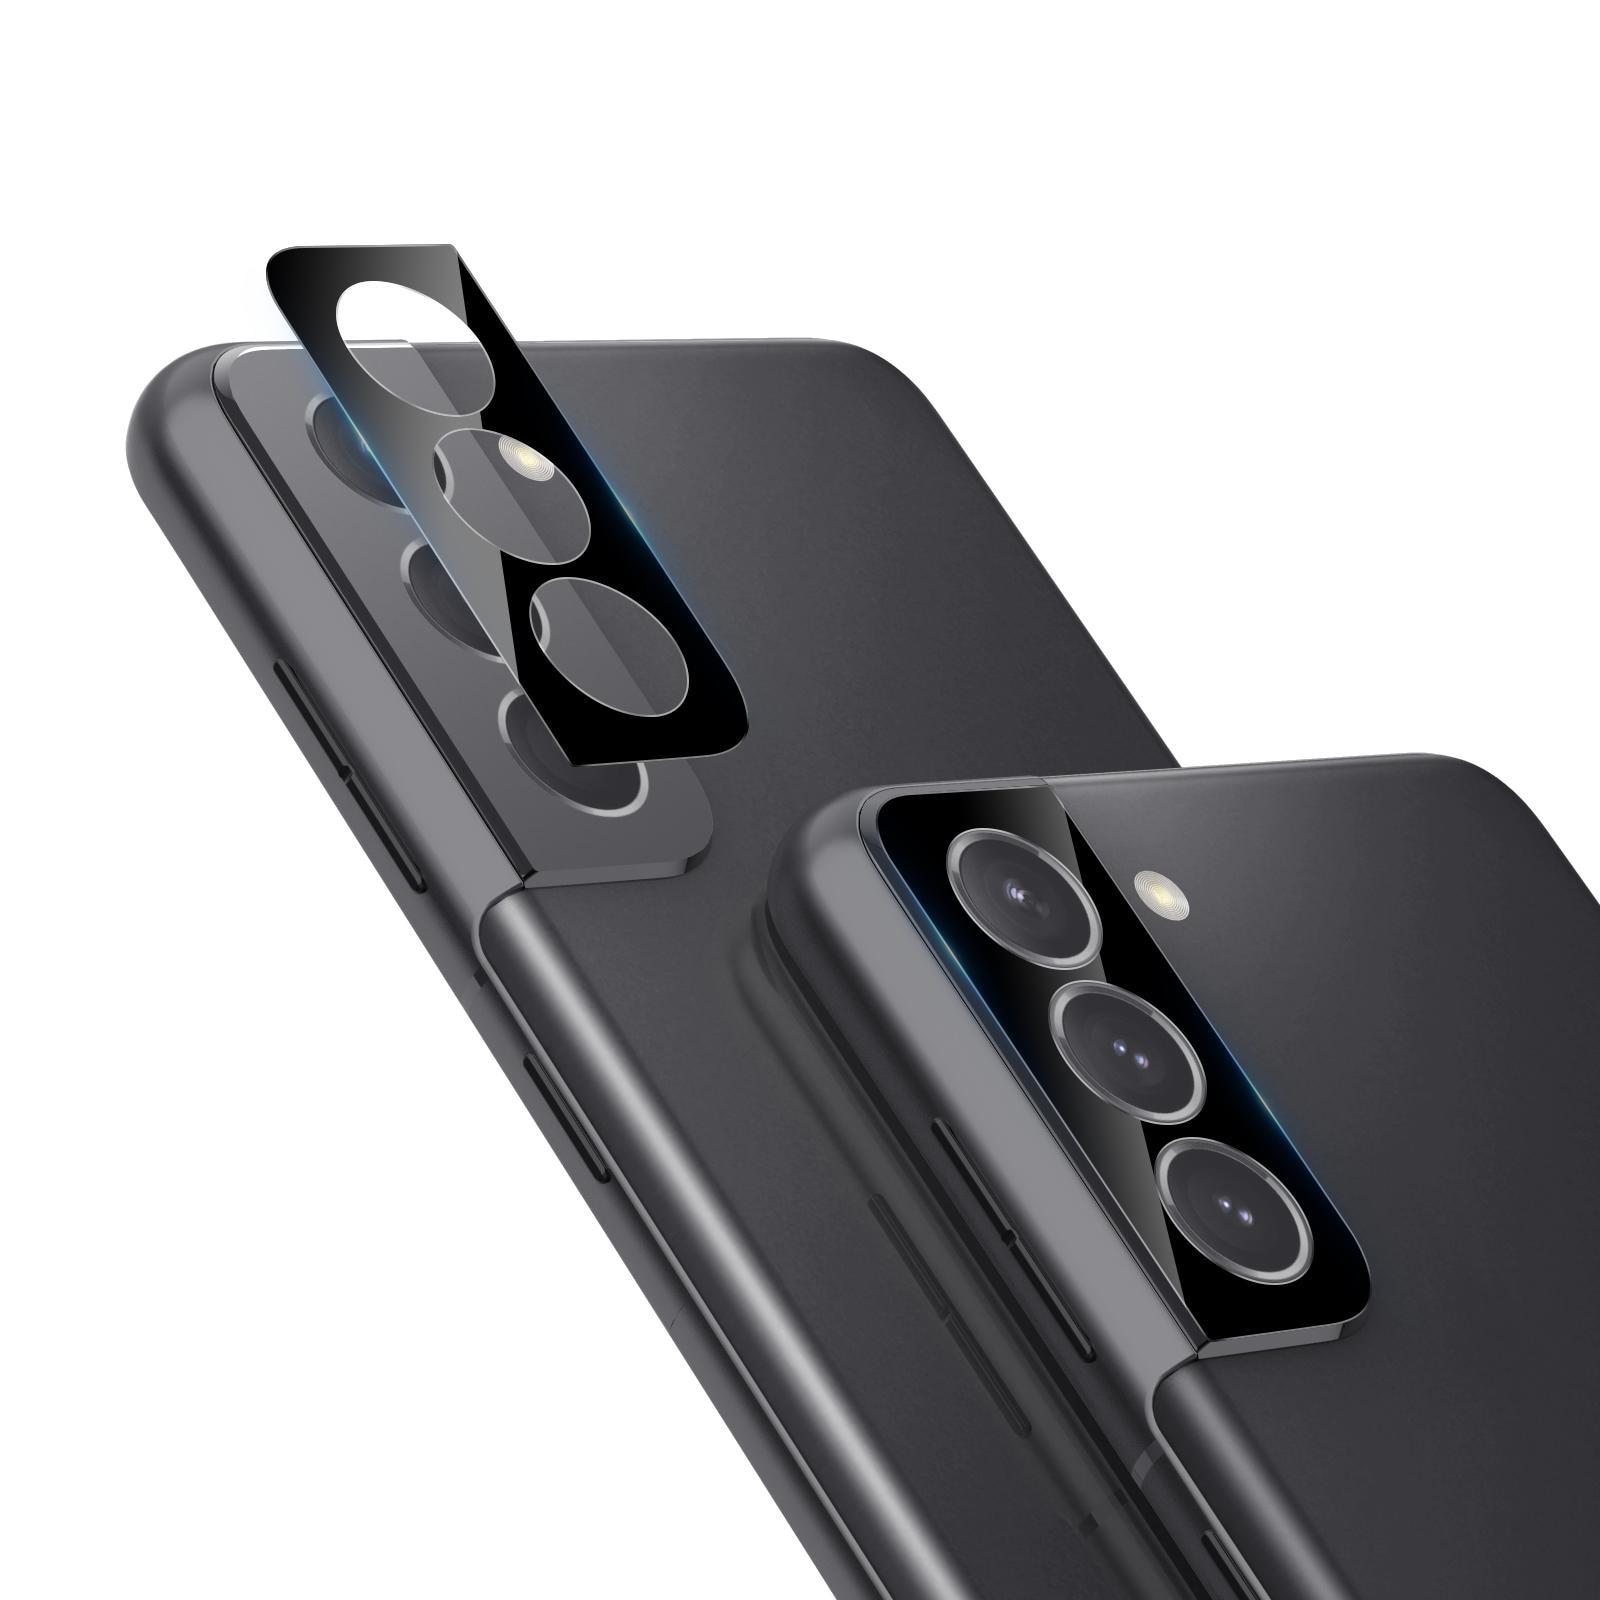 0.22mm InvisiFilm Kameraskydd Galaxy S21 (2-pack)